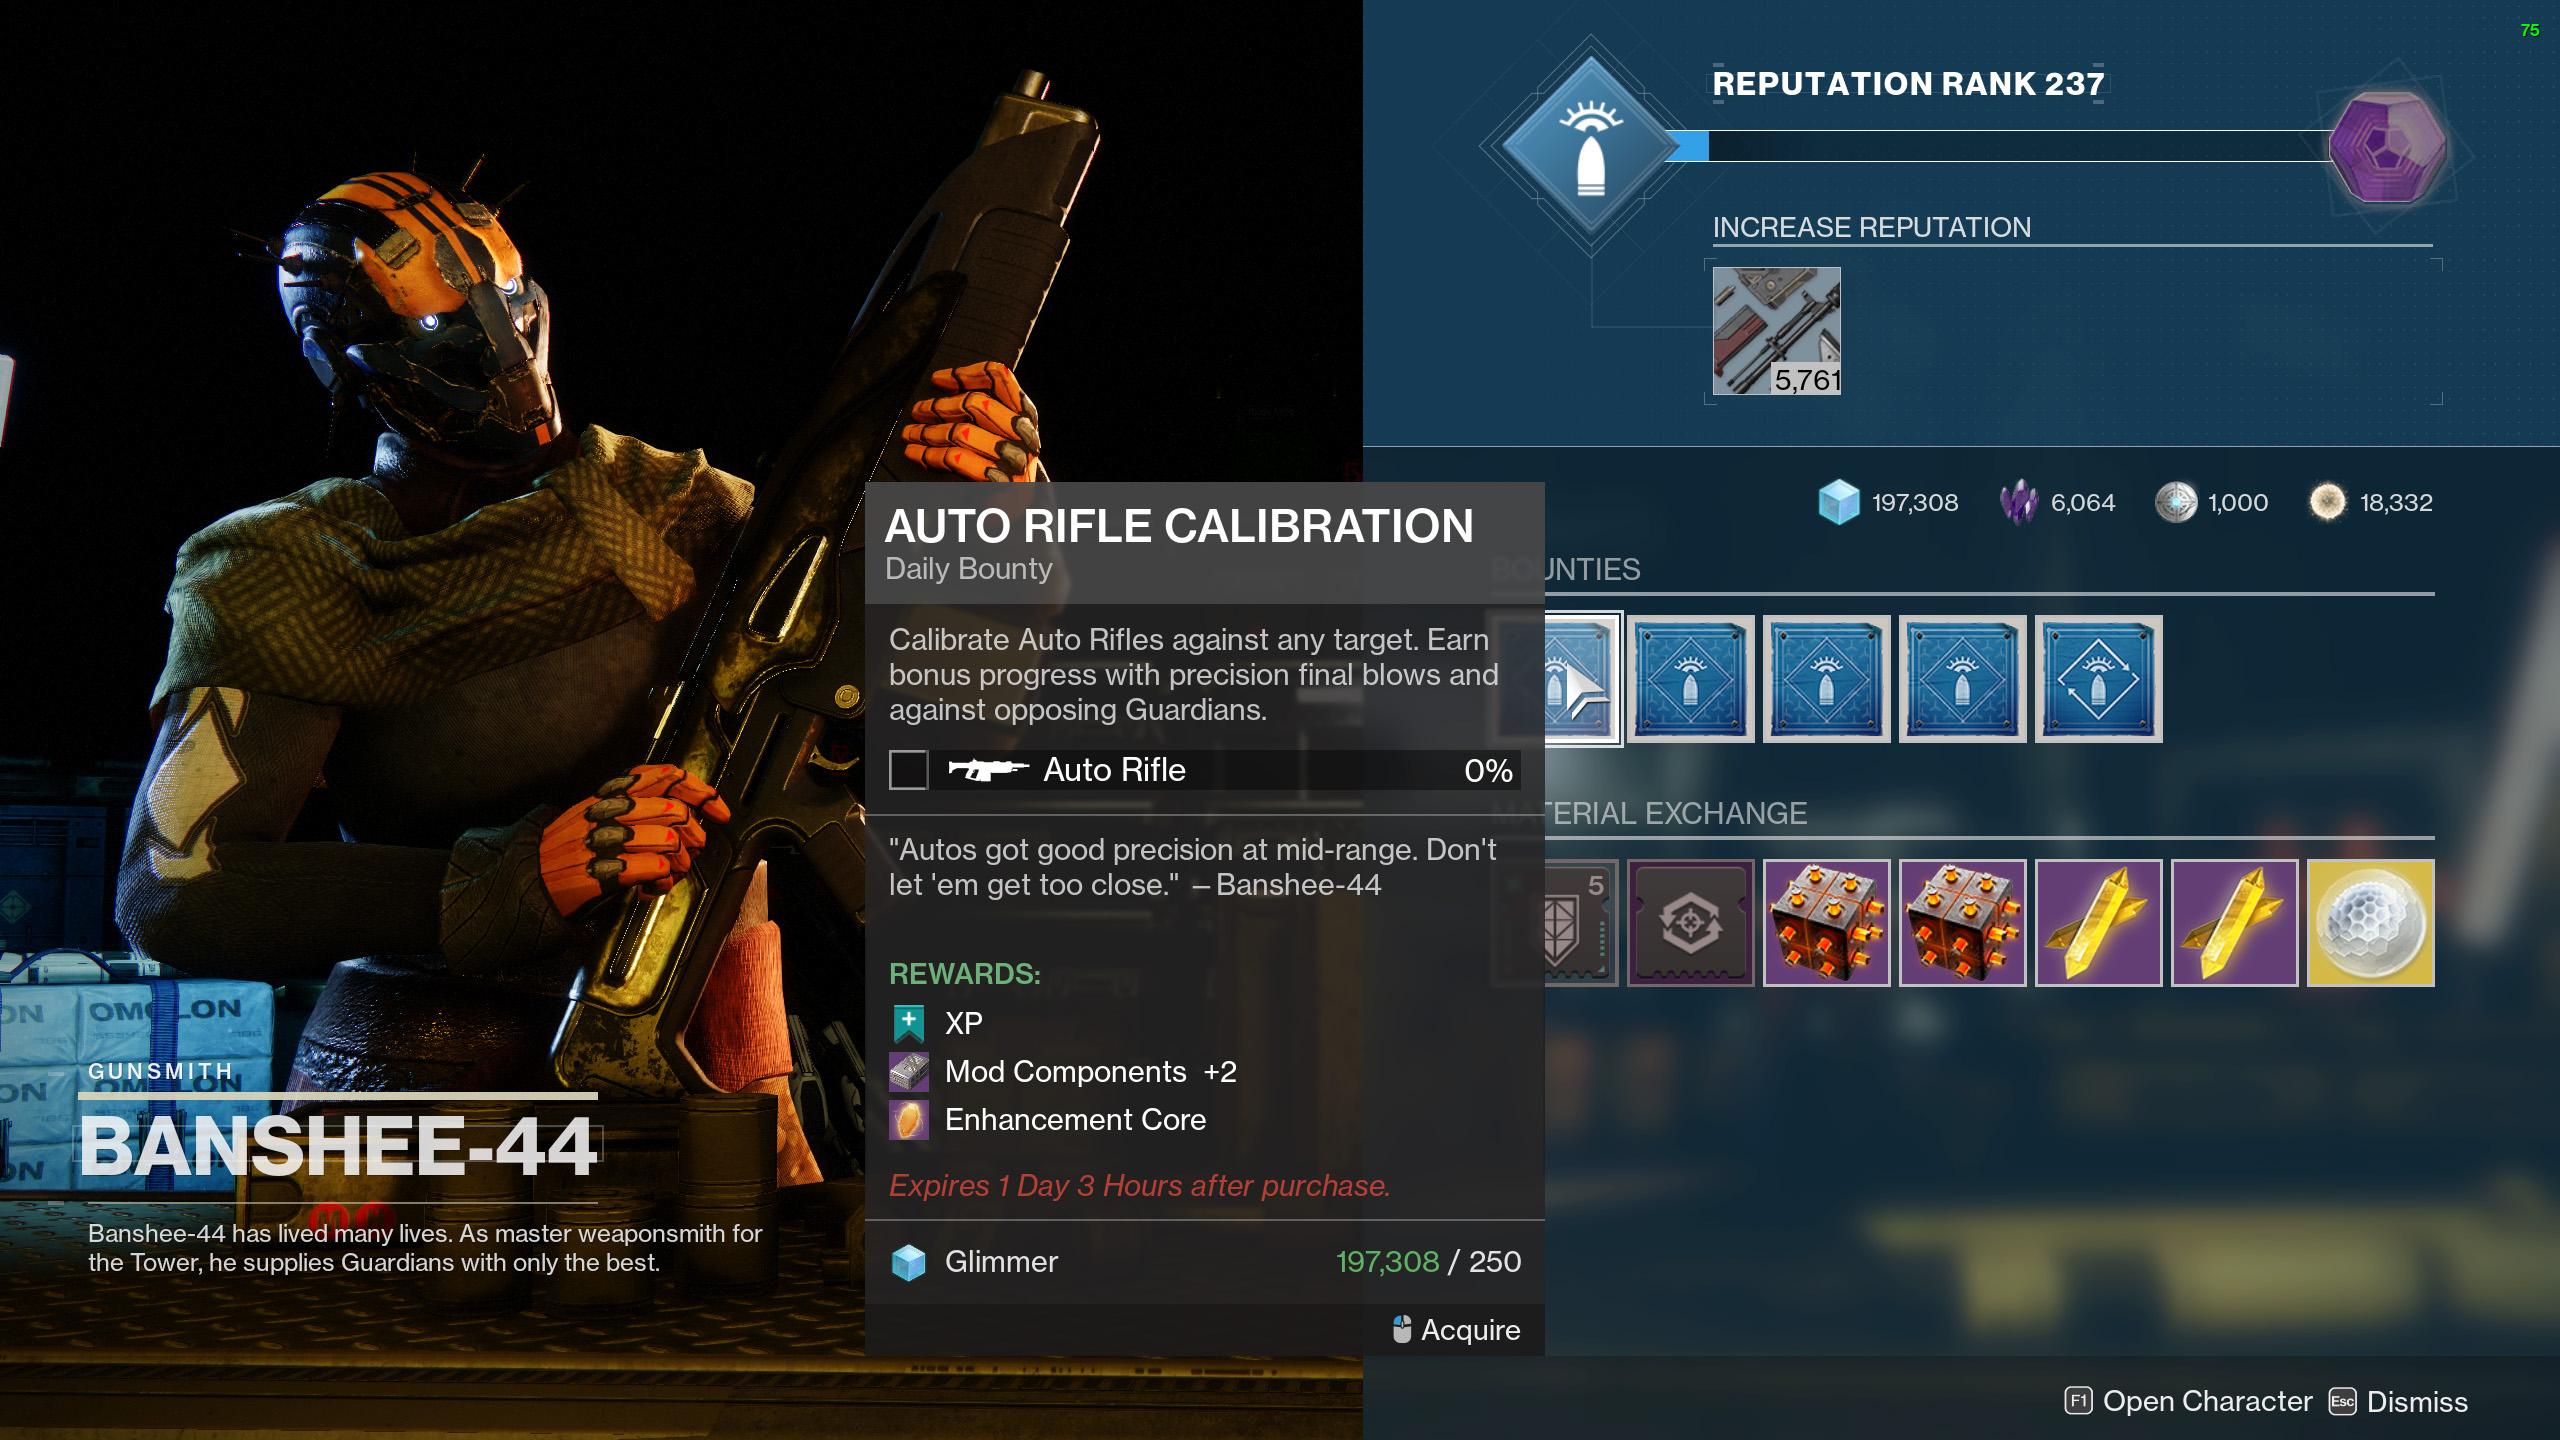 destiny 2 mod components